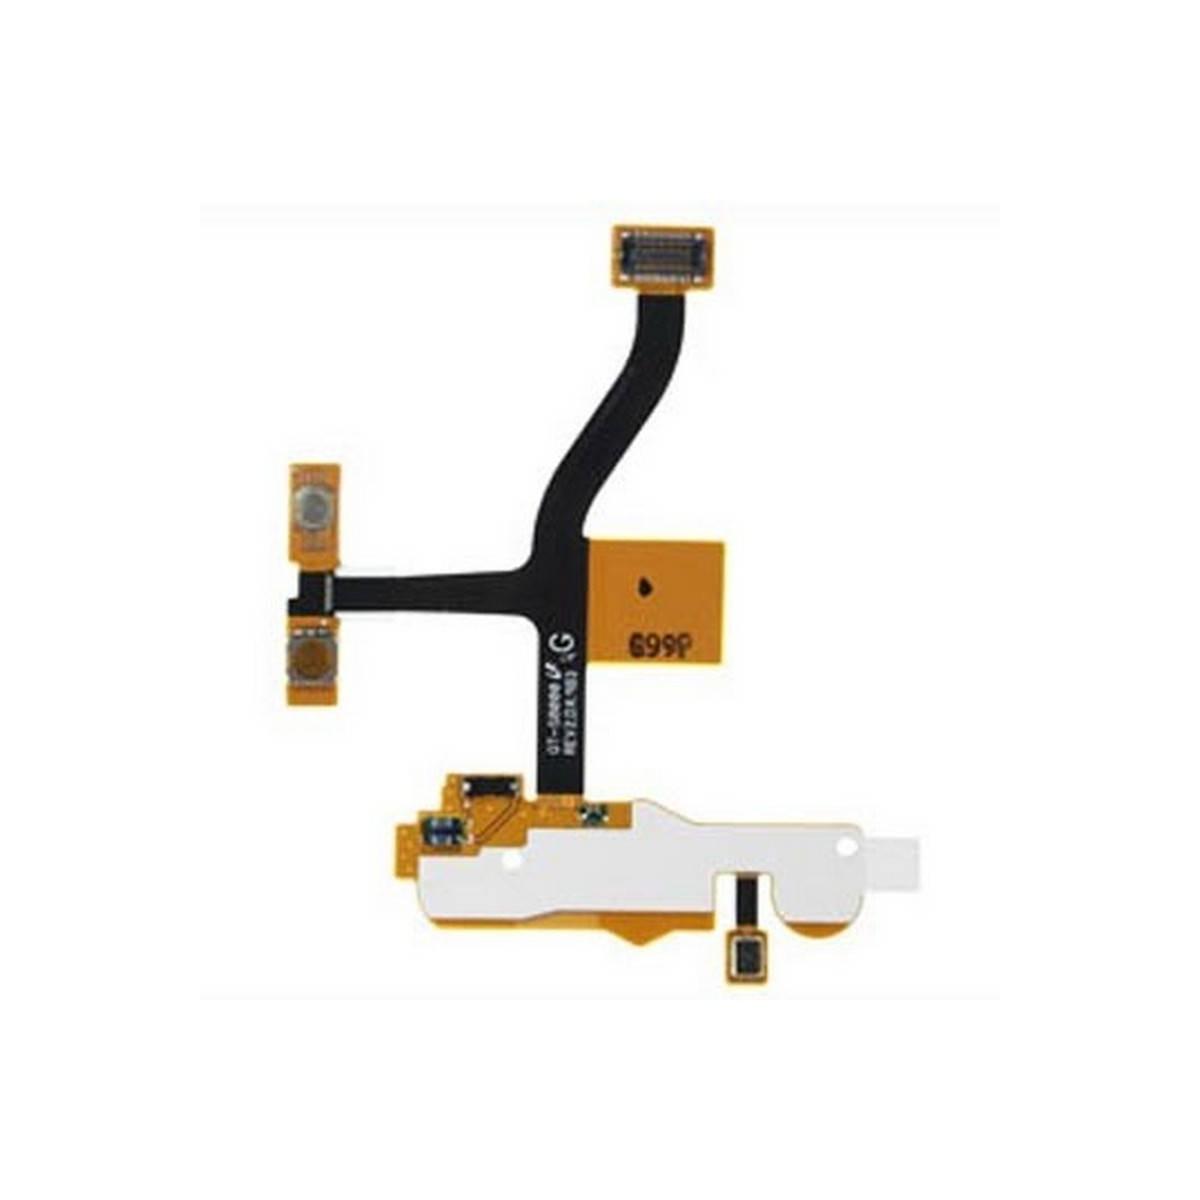 Samsung GT-S8000 Membrana + Cable flex